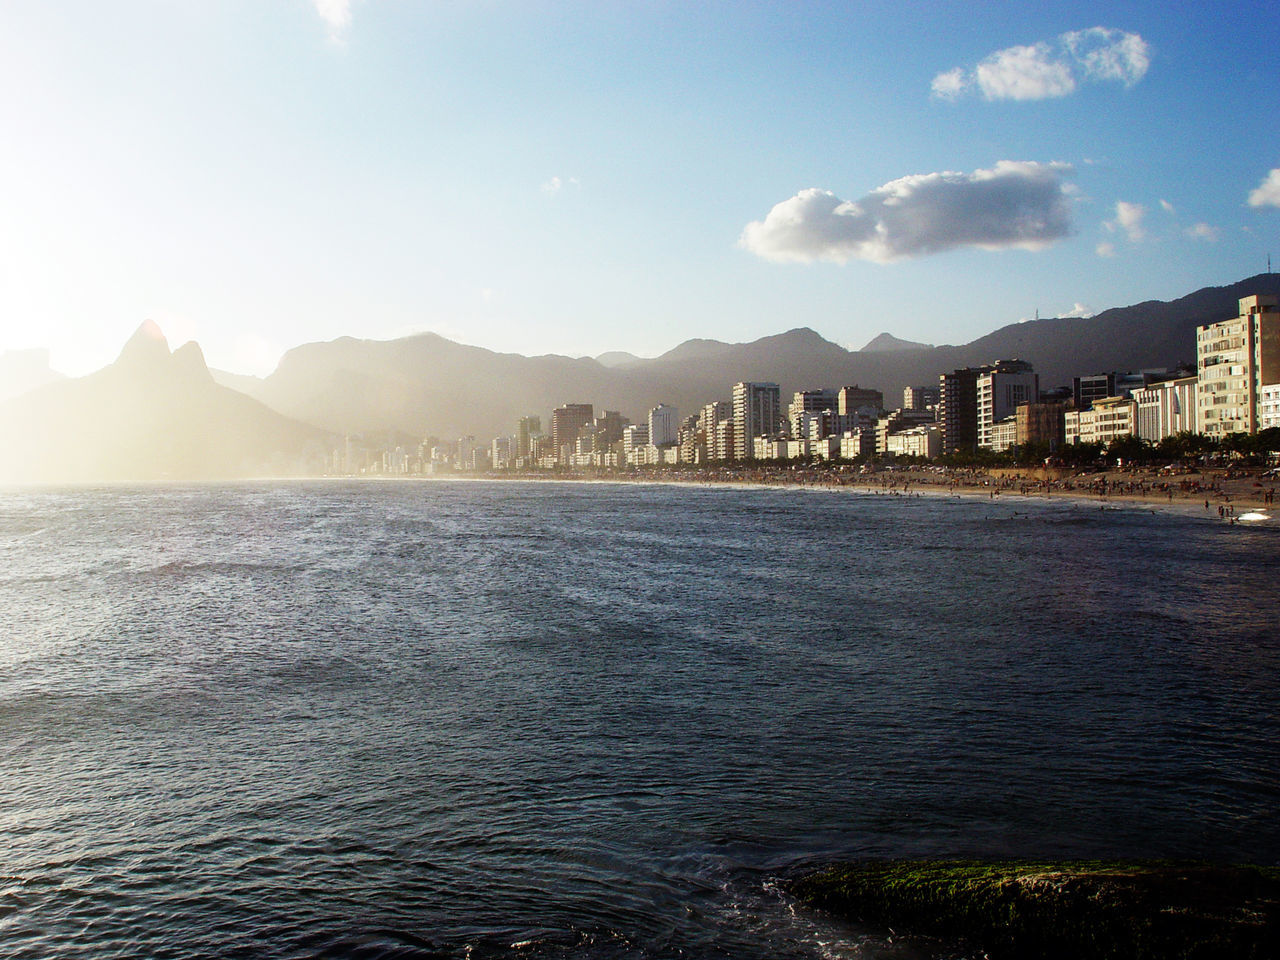 City Cloud - Sky Cultures Ipanema Brazi Landscape Mountain Sea Sunset Travel Destinations Water